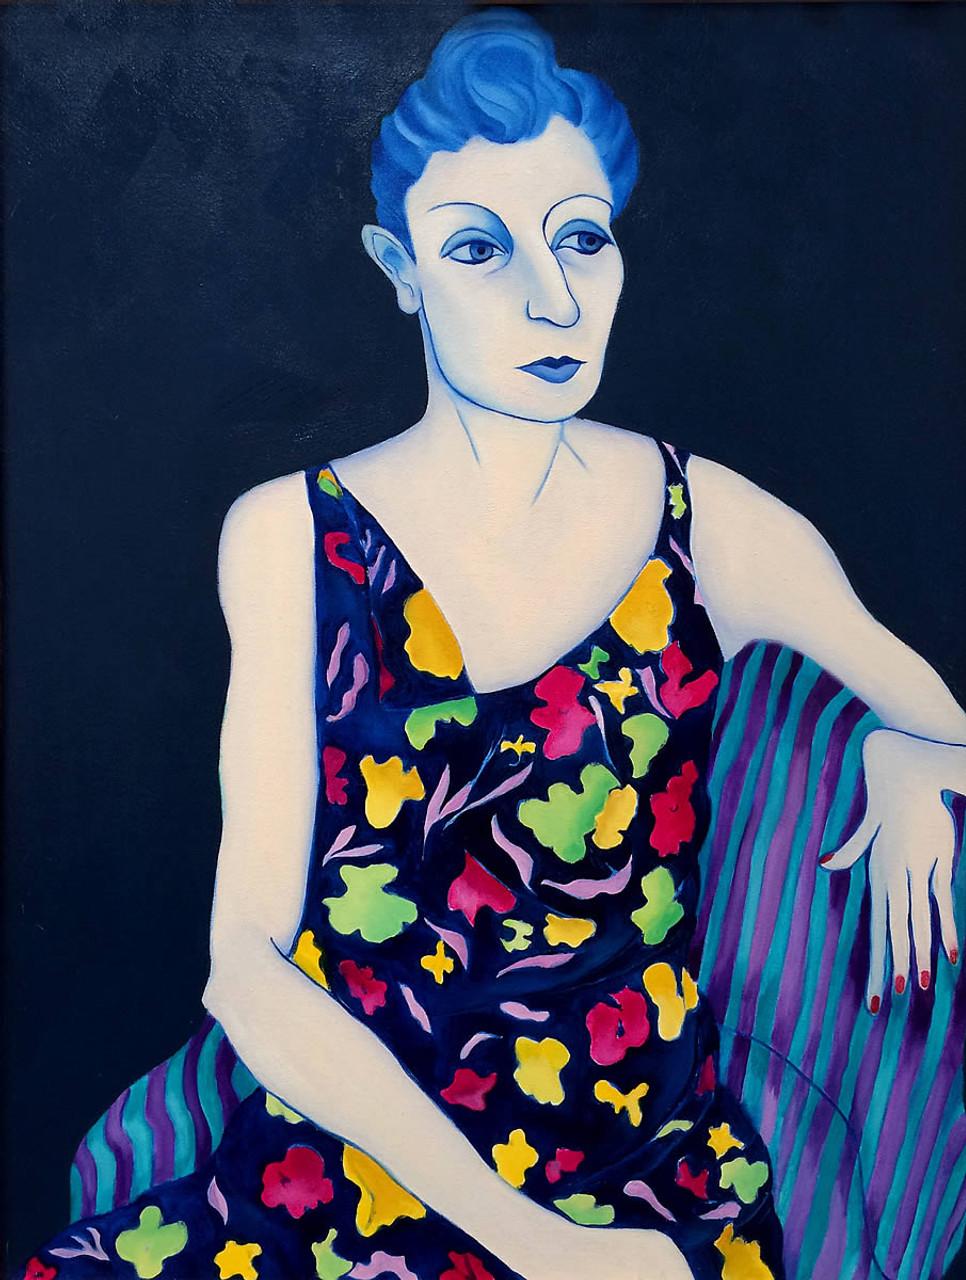 Woman in Flowered Dress